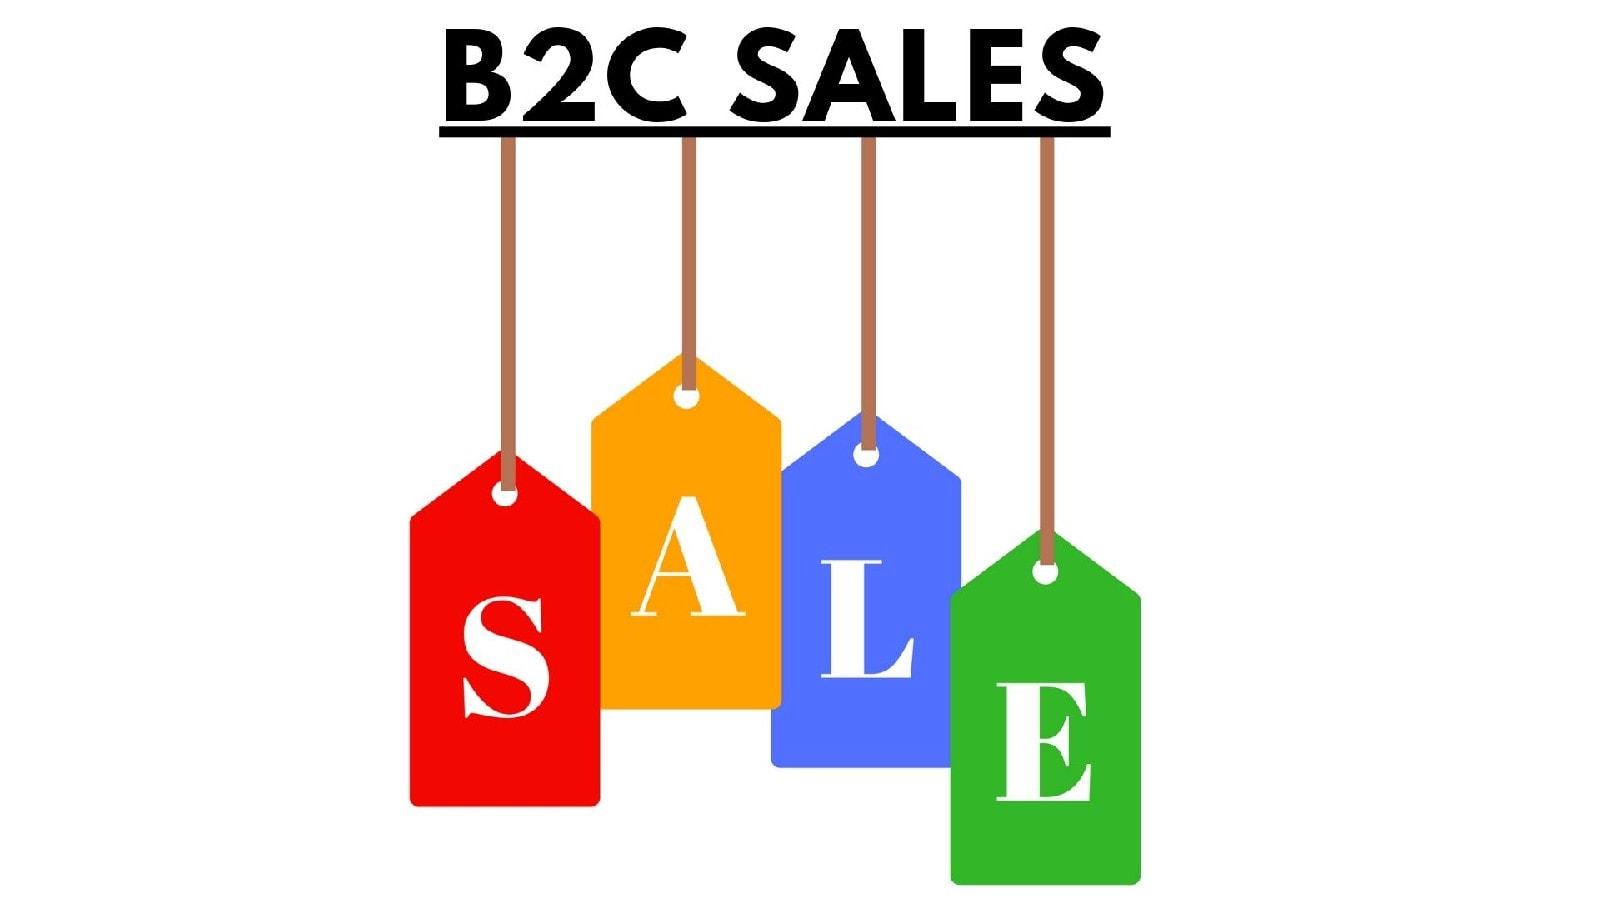 B2C sales